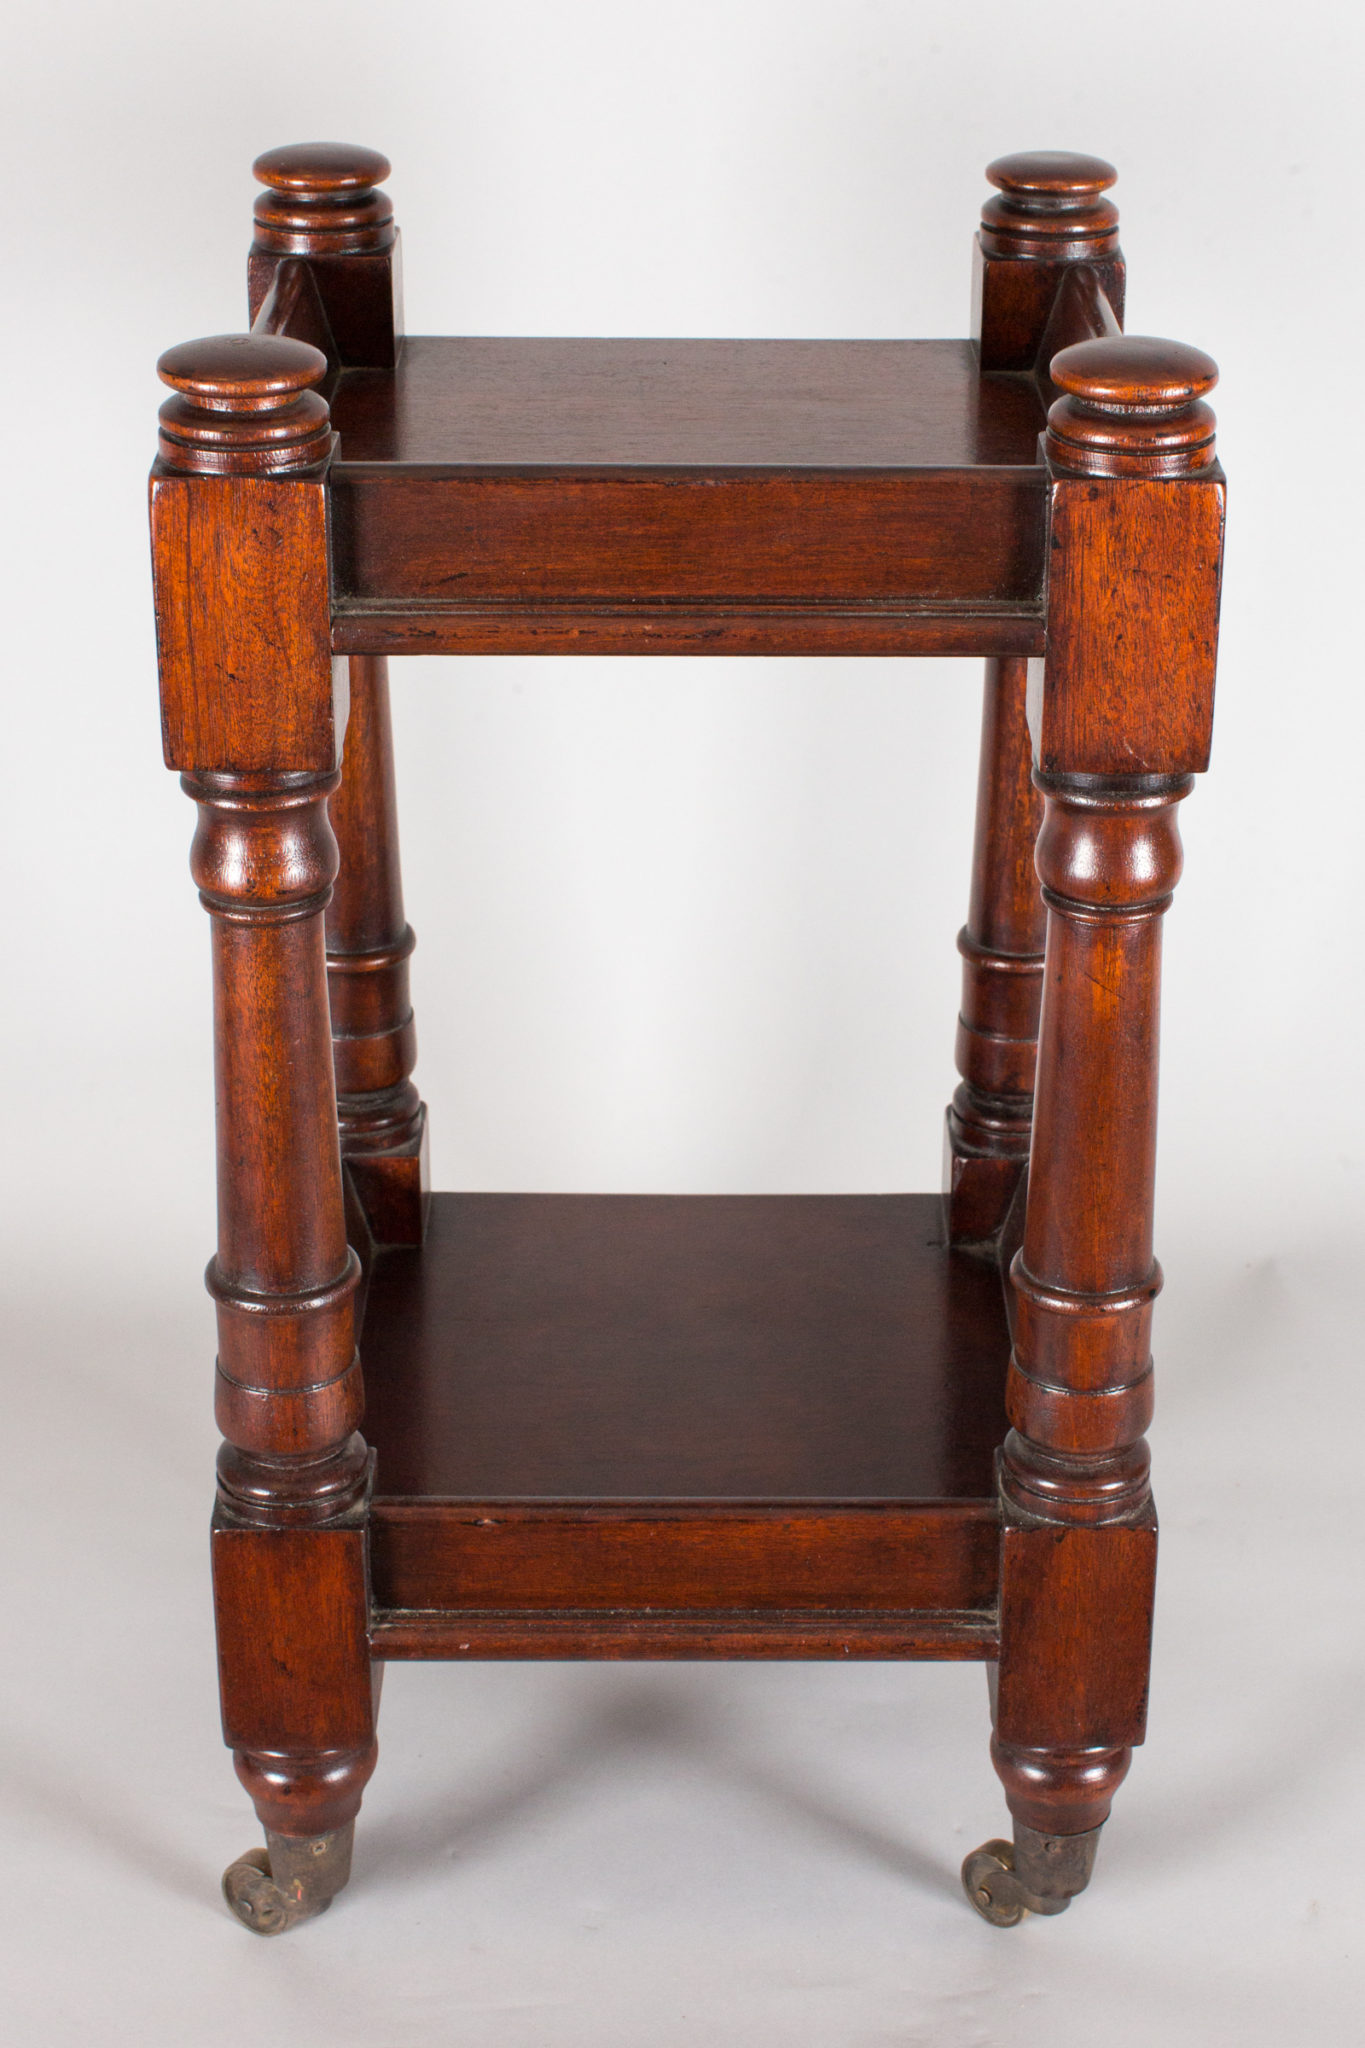 Custom Oxford Mahogany Trolley Table